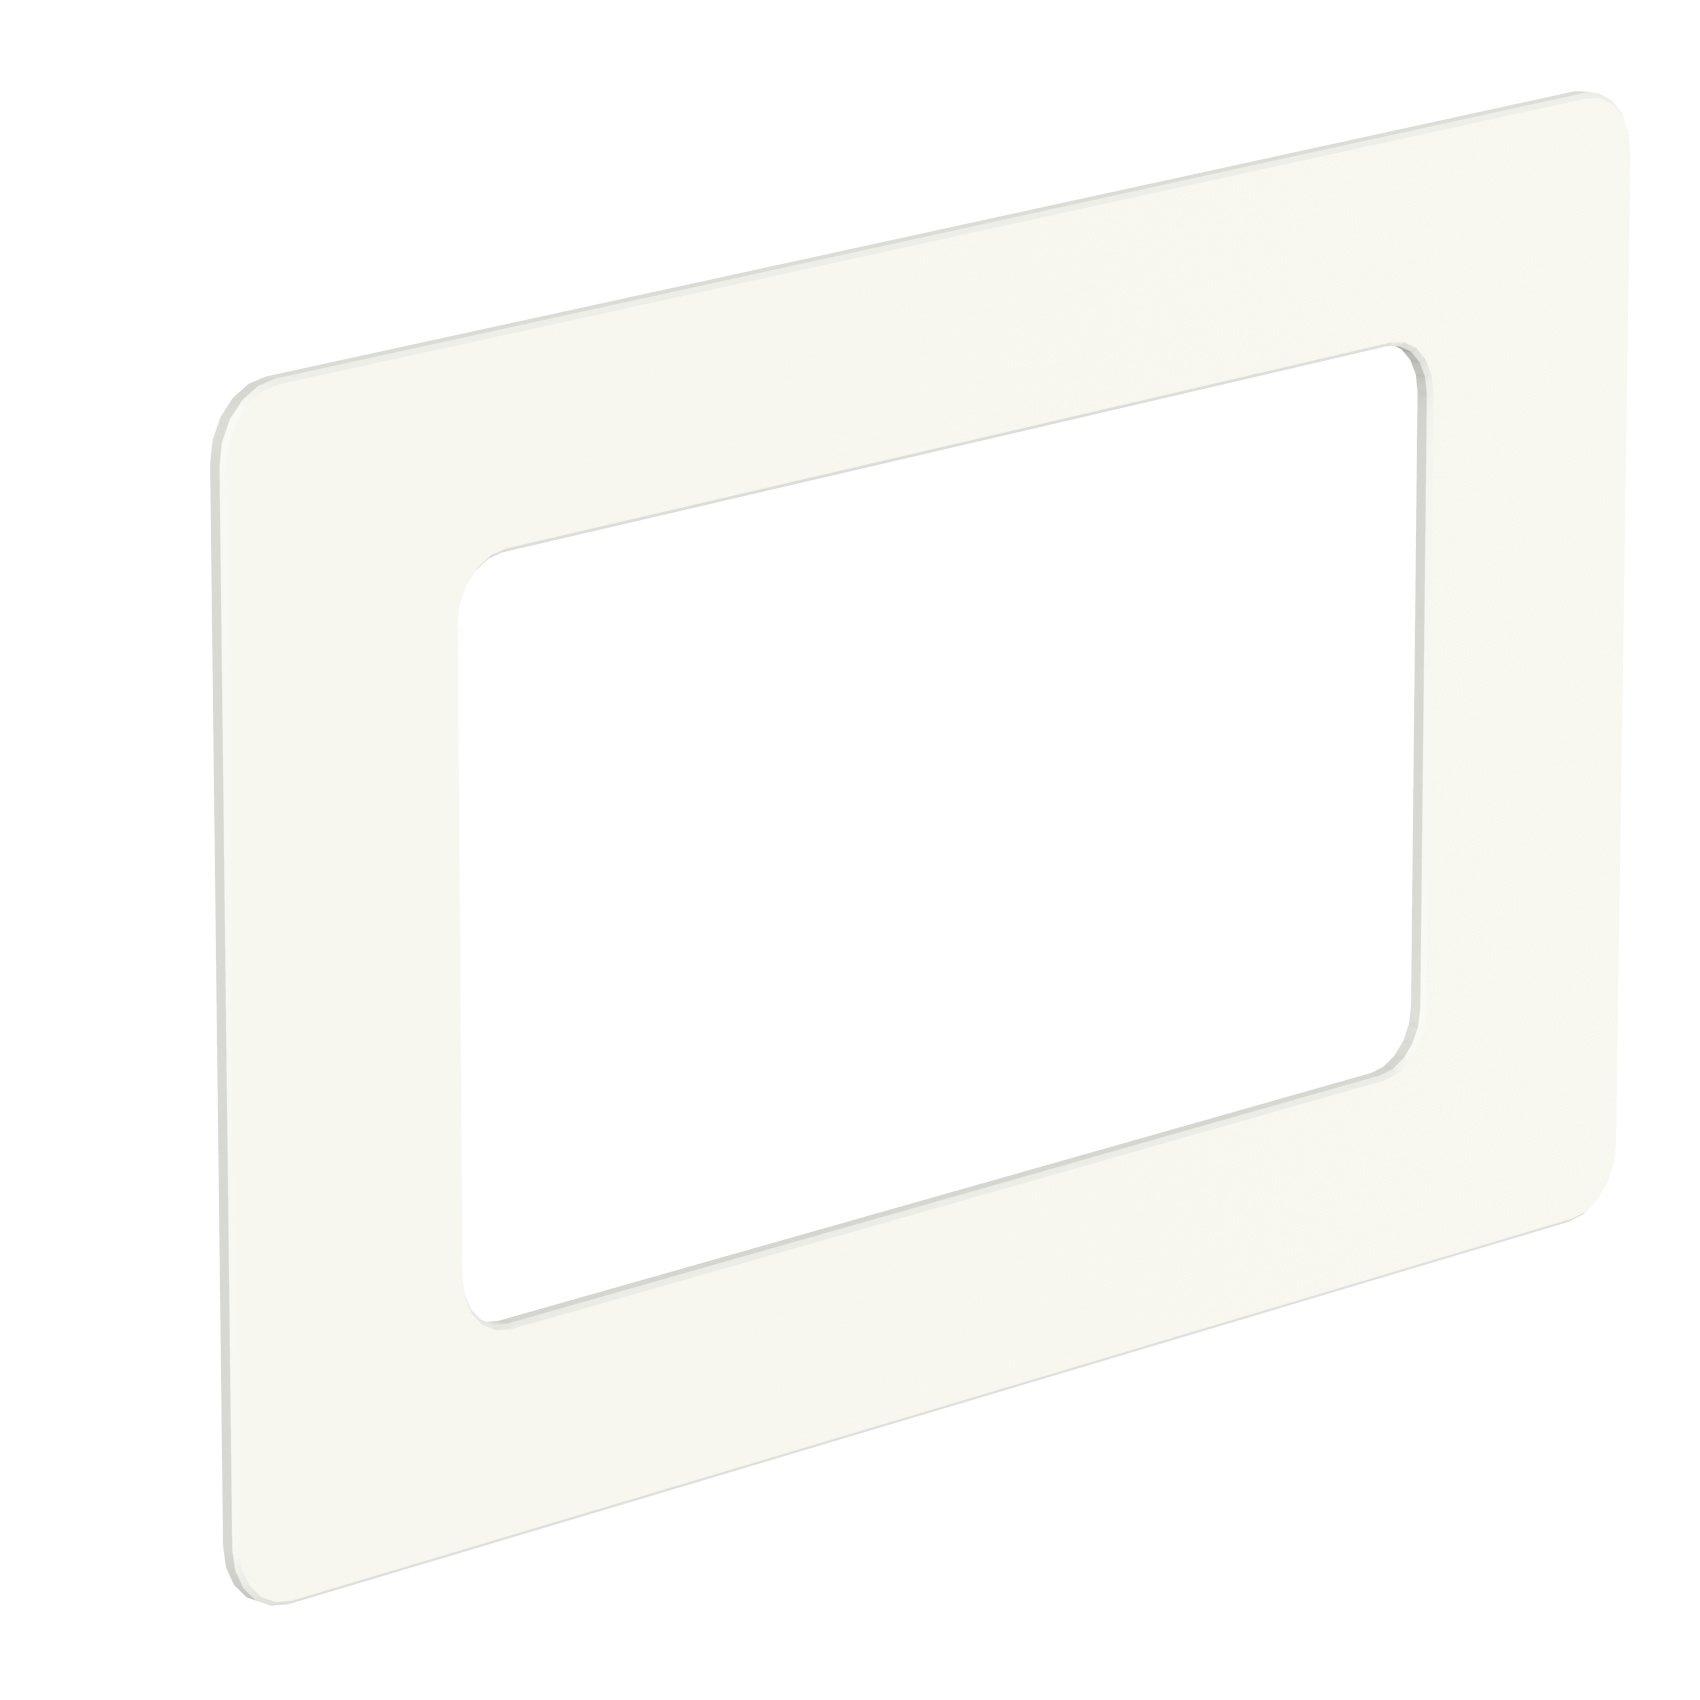 VidaMount On-Wall Tablet Mount - Samsung Galaxy Tab A 7.0 - White by VidaBox Kiosks (Image #8)